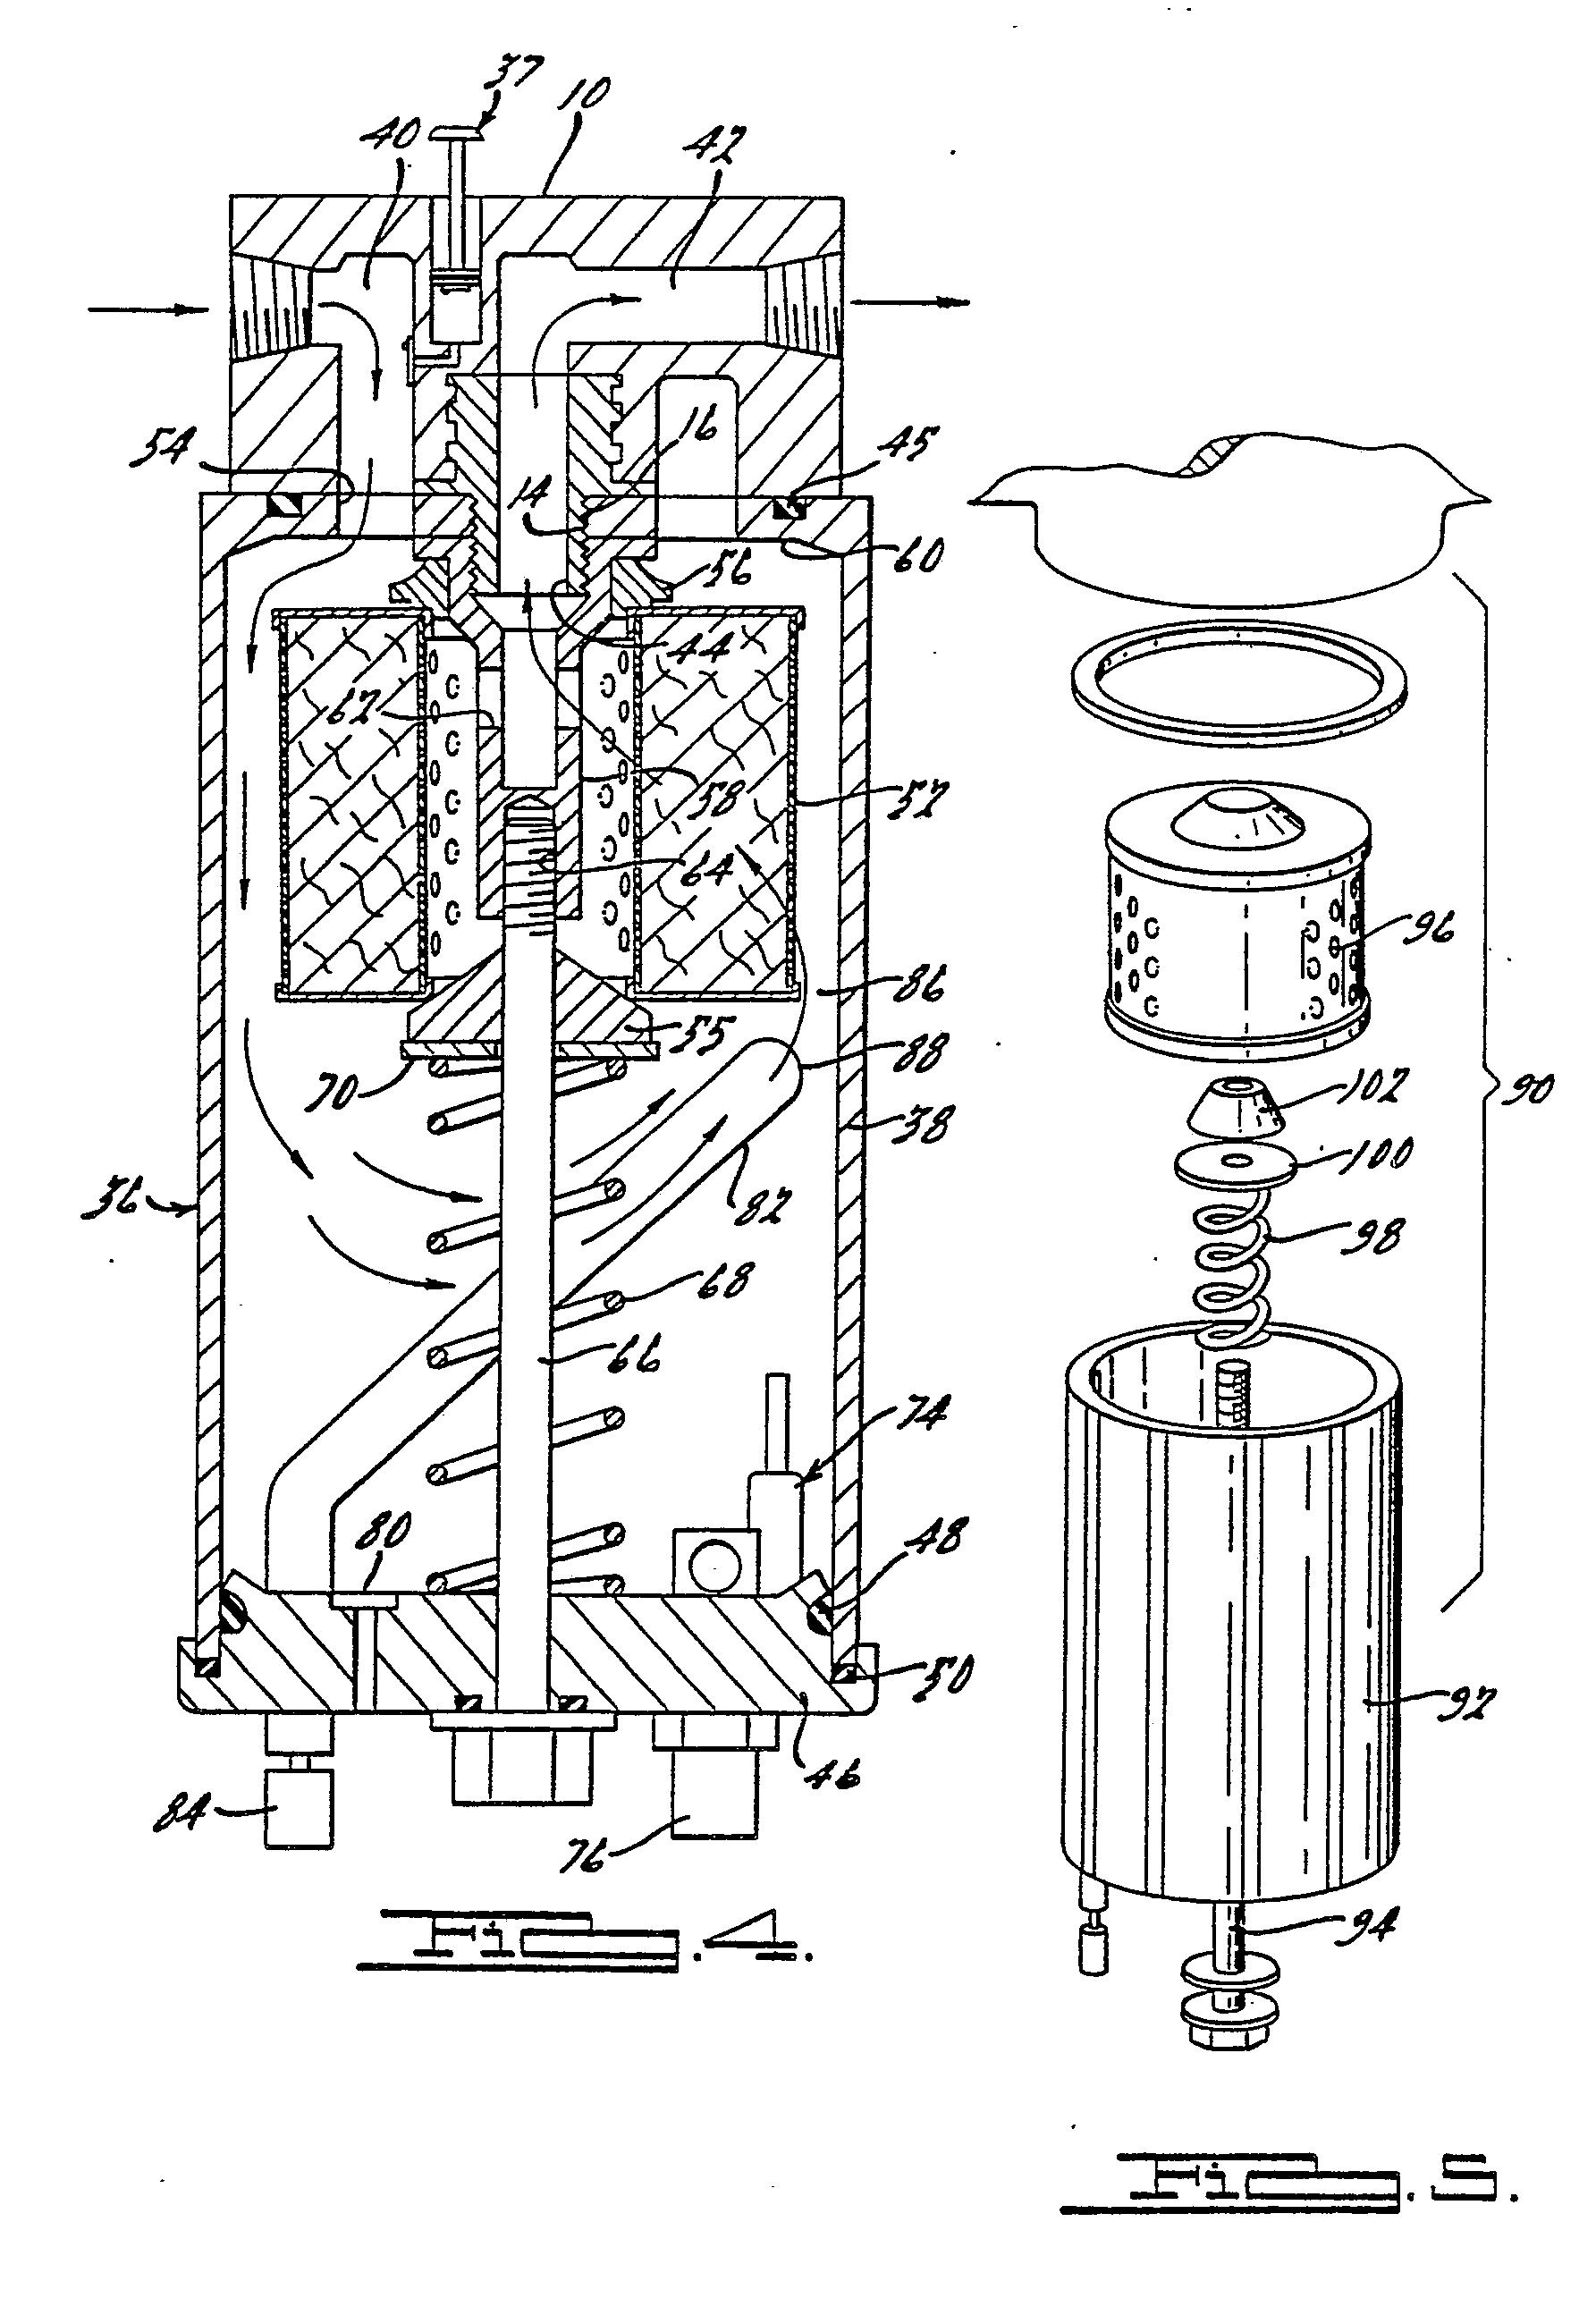 patent ep0168160b1